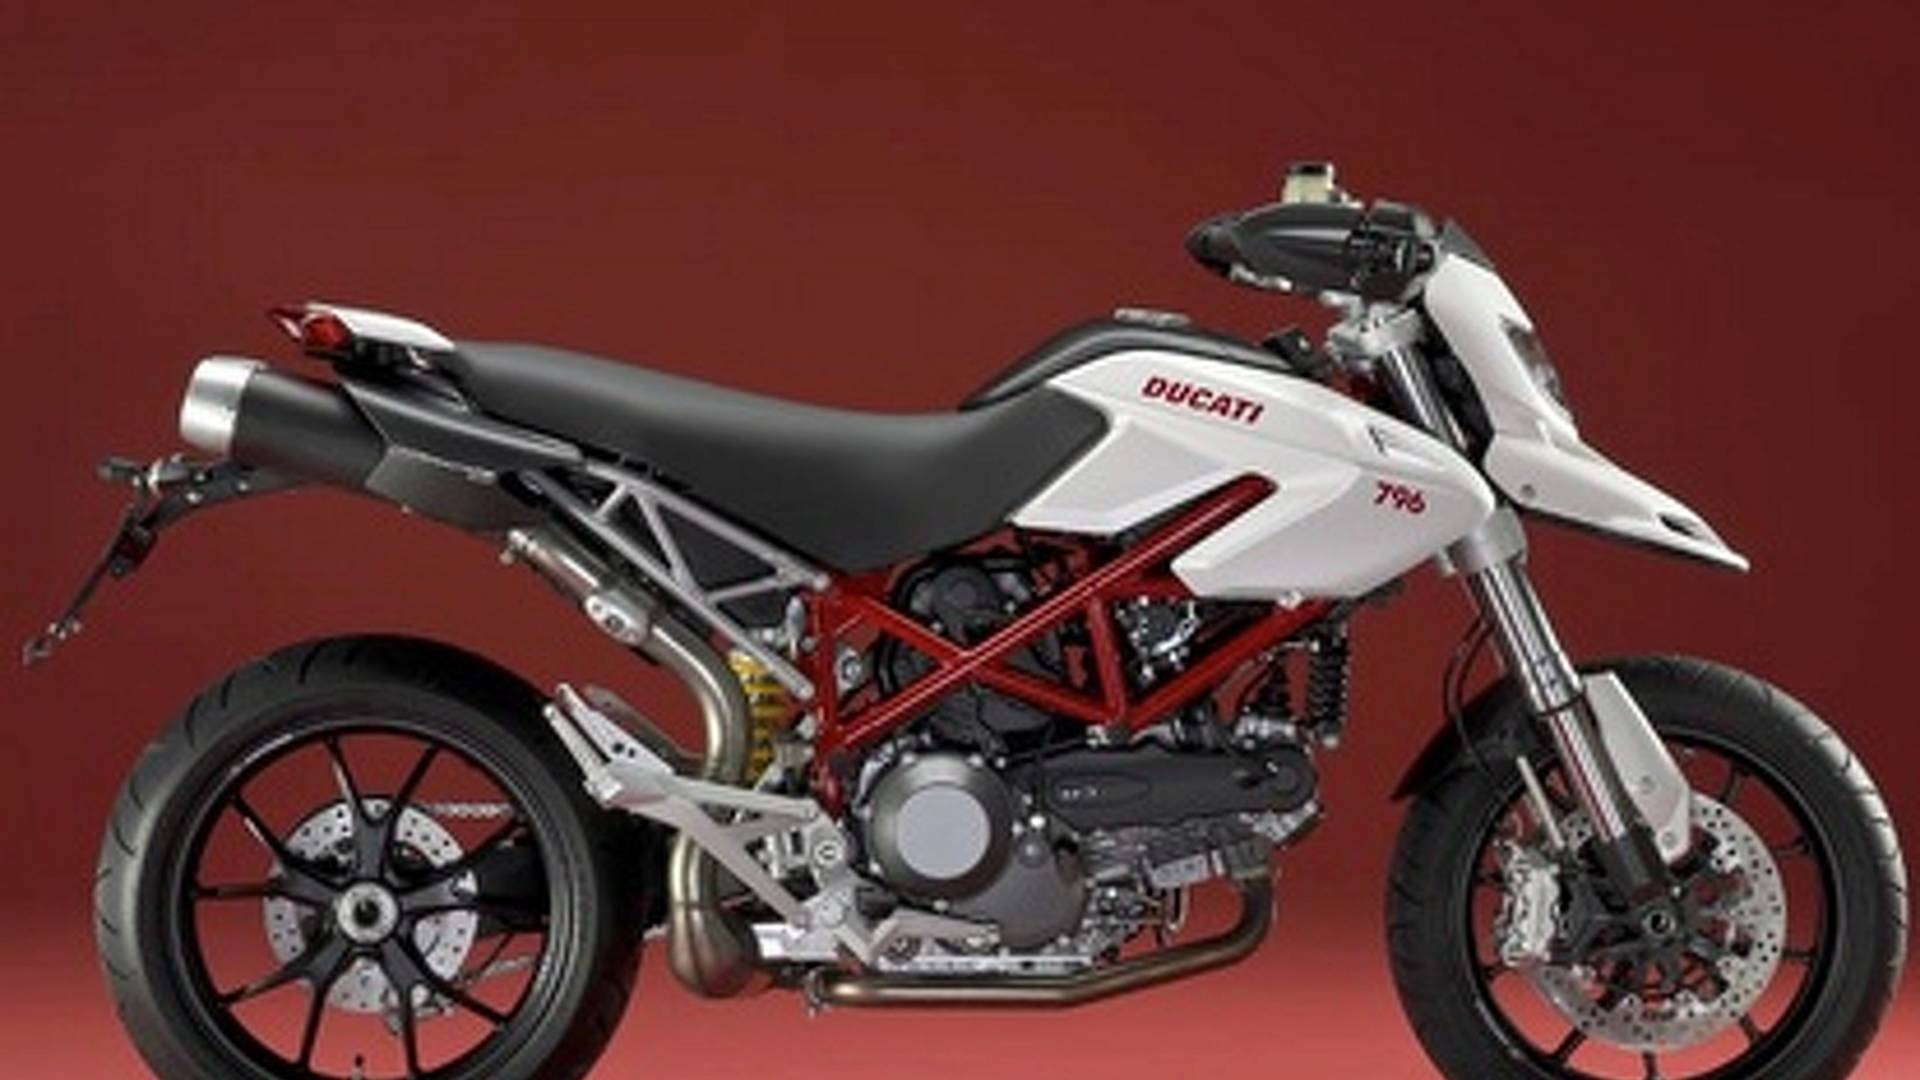 Ducati Hypermotard 796 Smaller And Cheaper For 2010